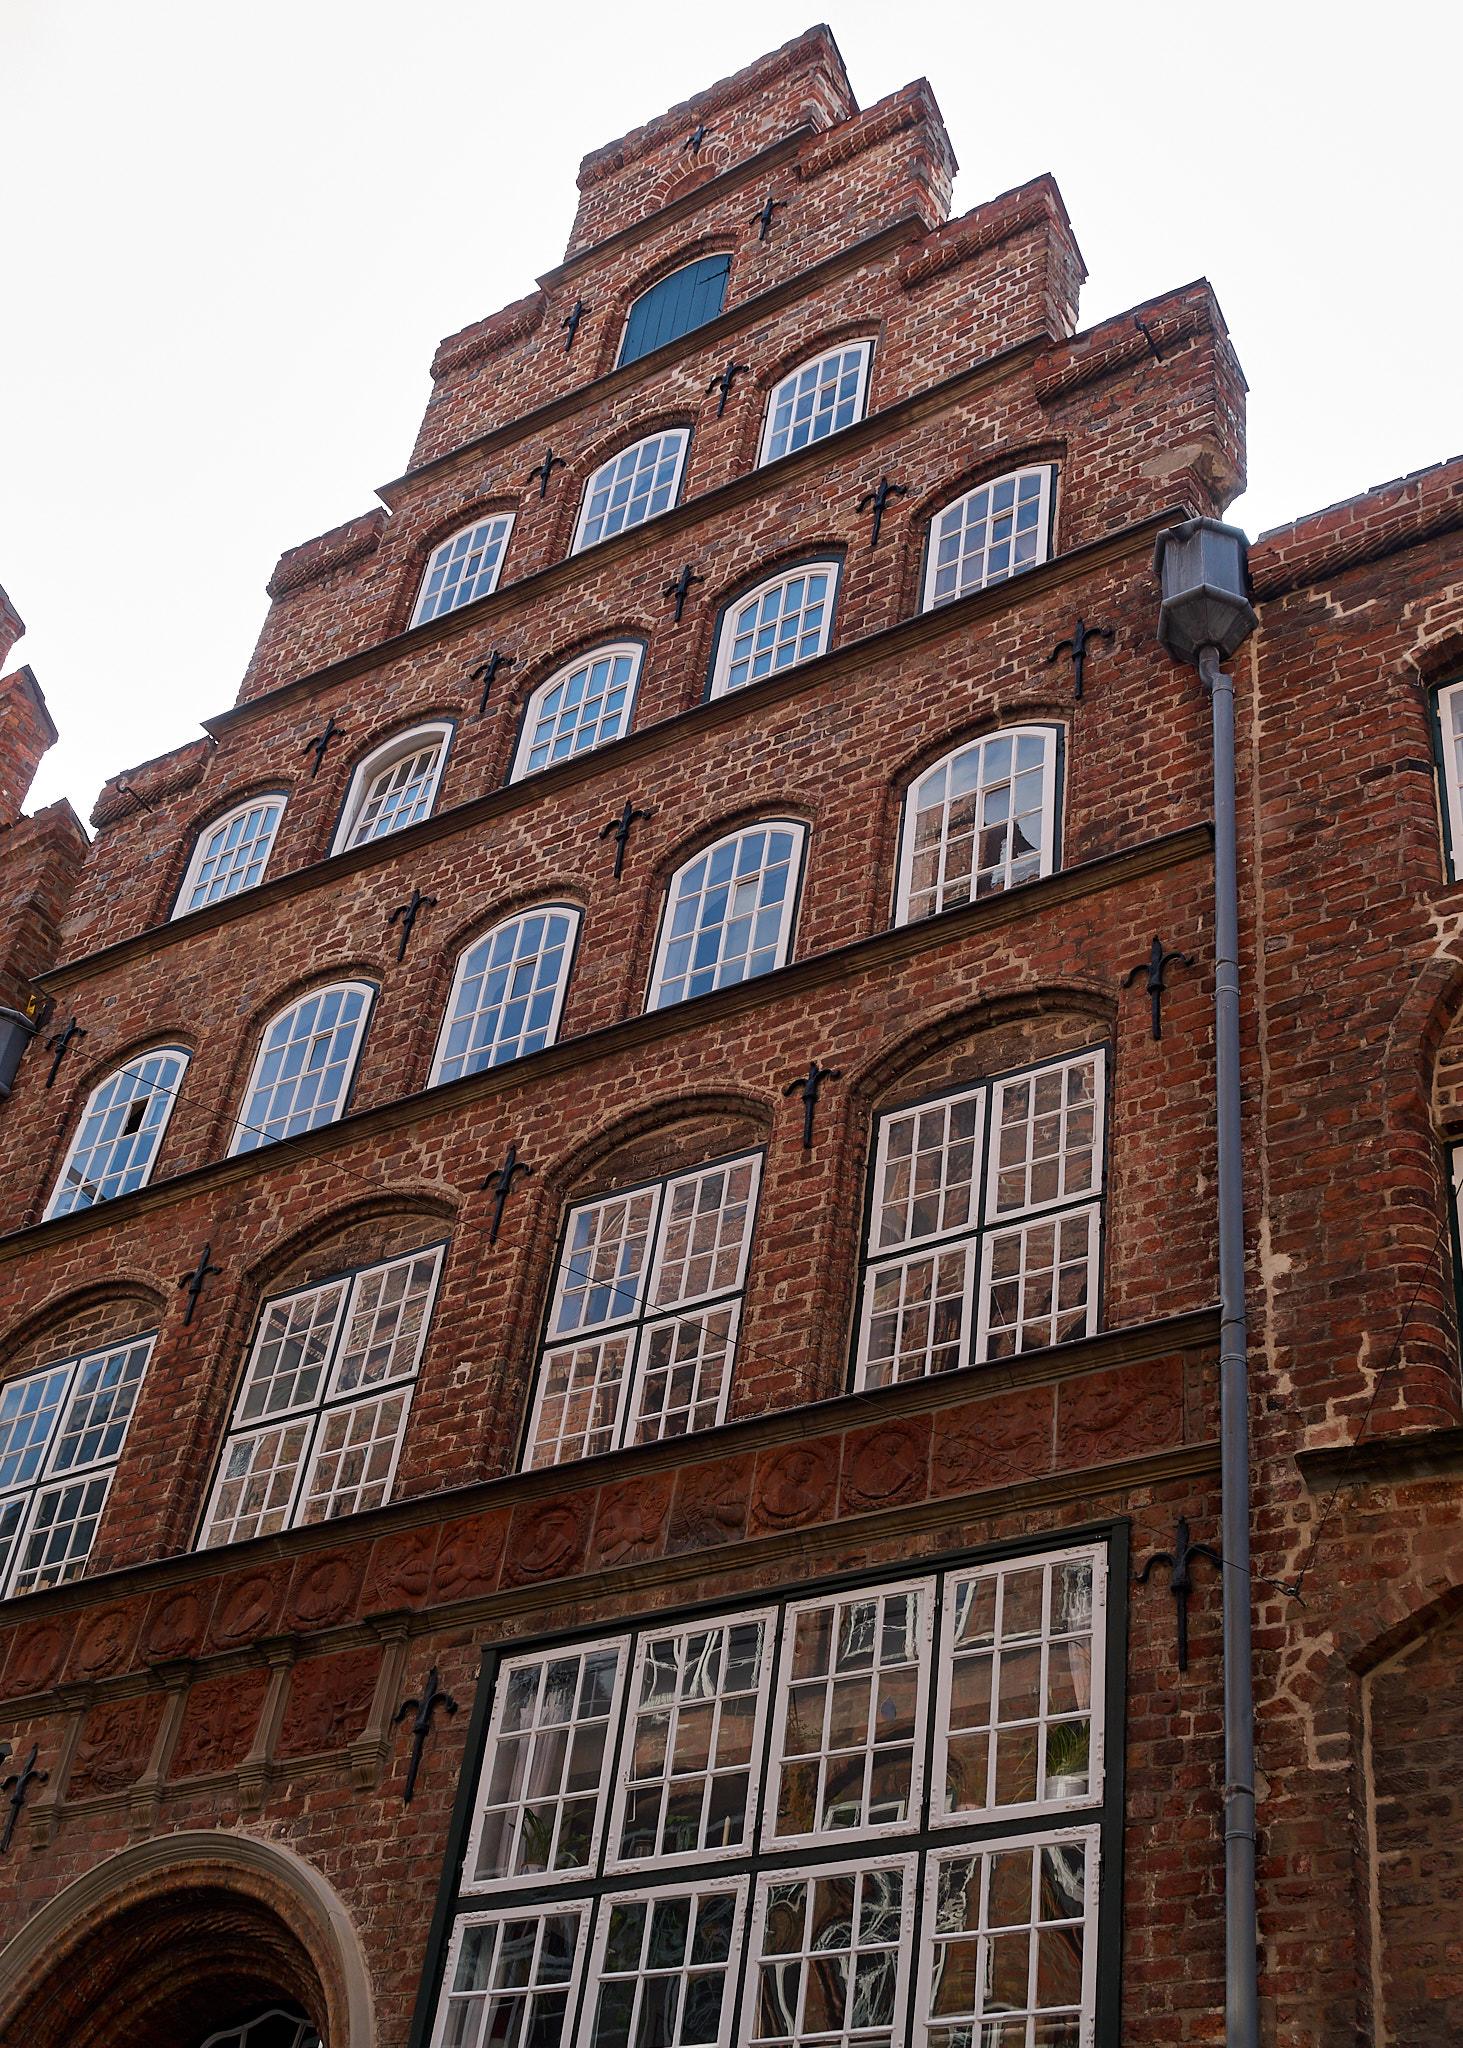 20190330-Lübeck-330.jpg